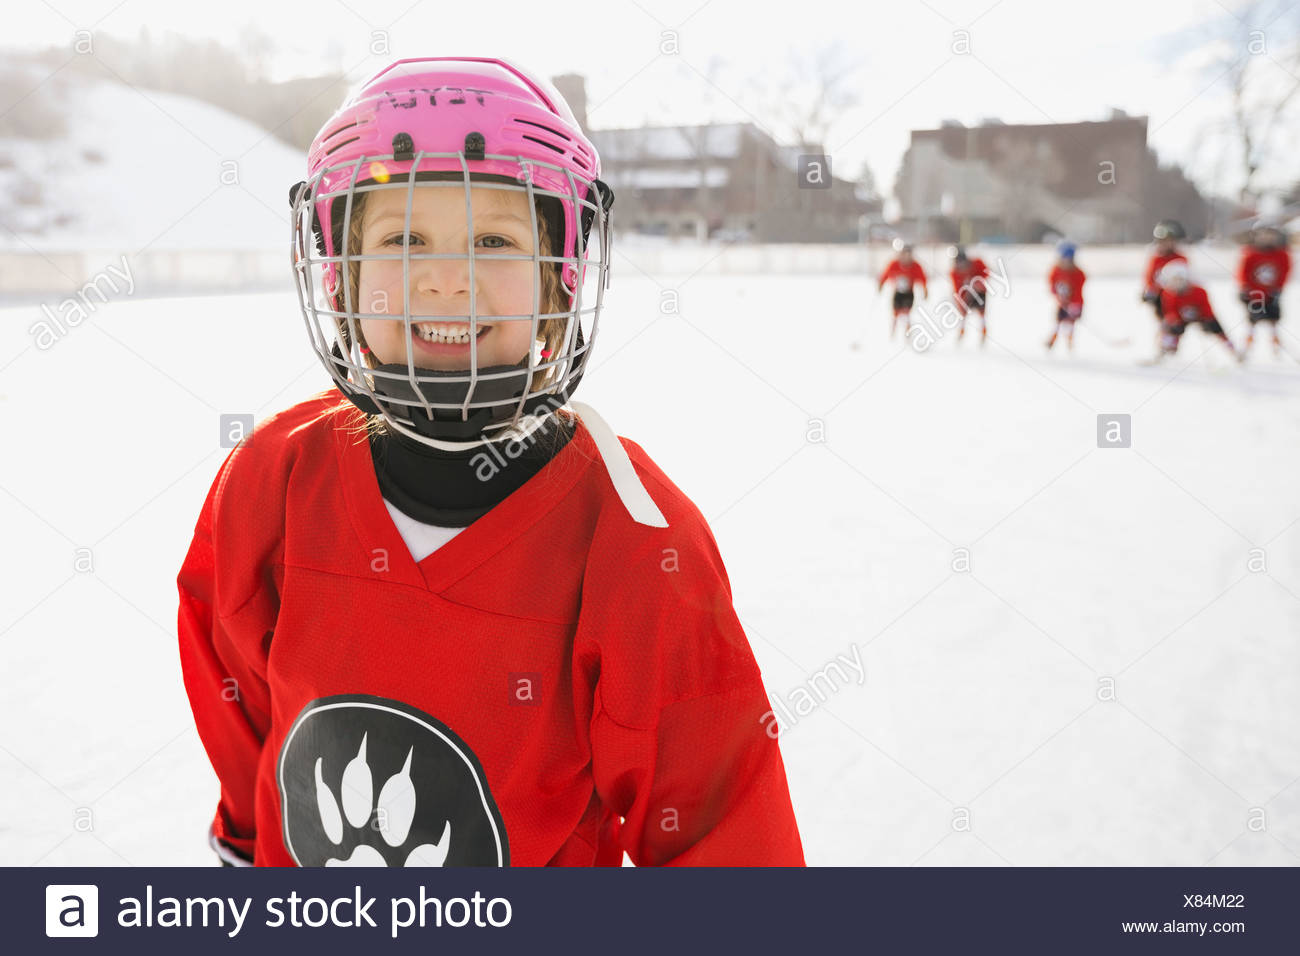 Portrait of smiling girl in ice hockey uniform - Stock Image